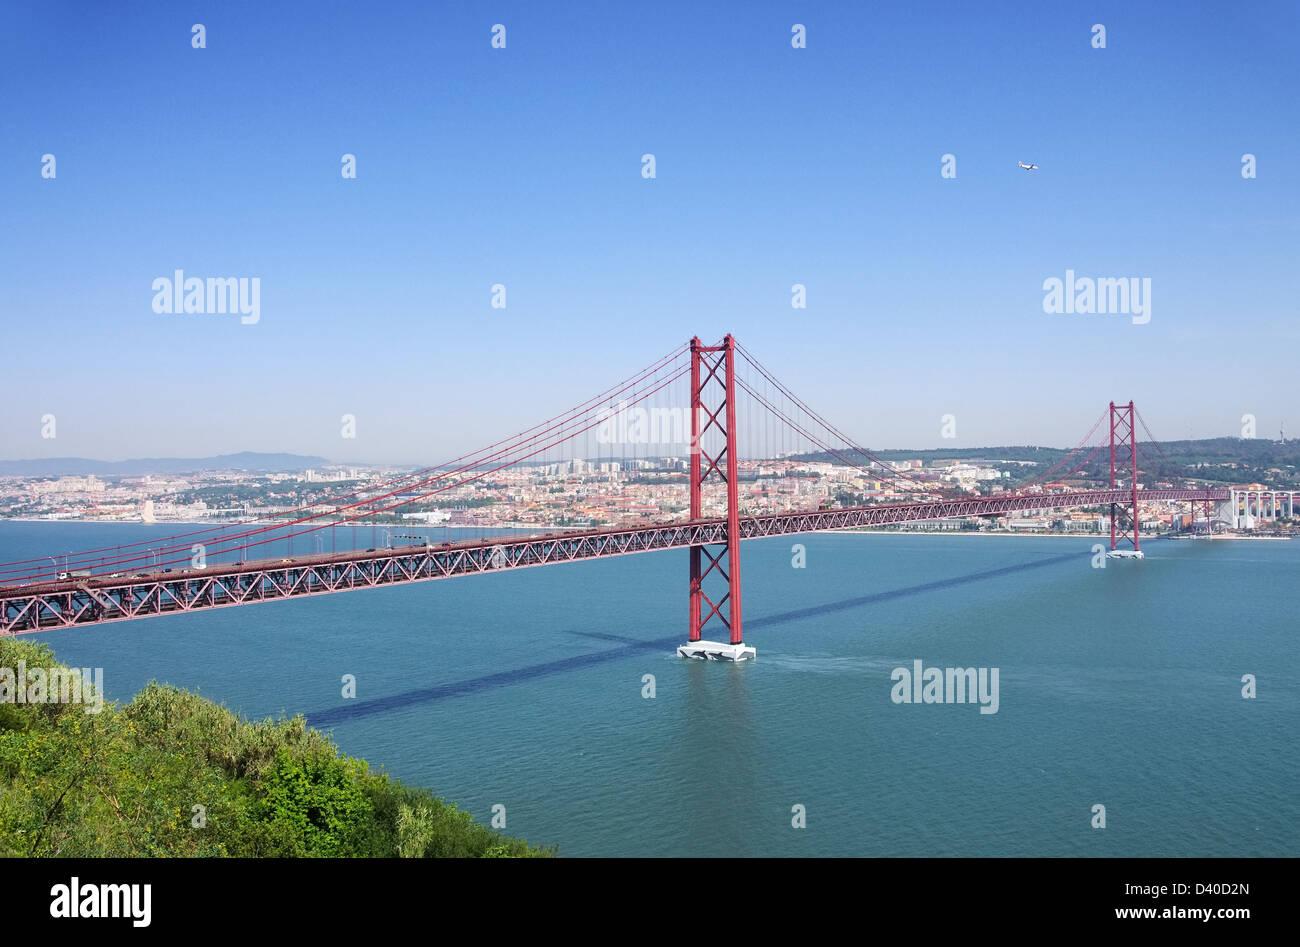 Lissabon Bruecke - Lisbon bridge 02 - Stock Image